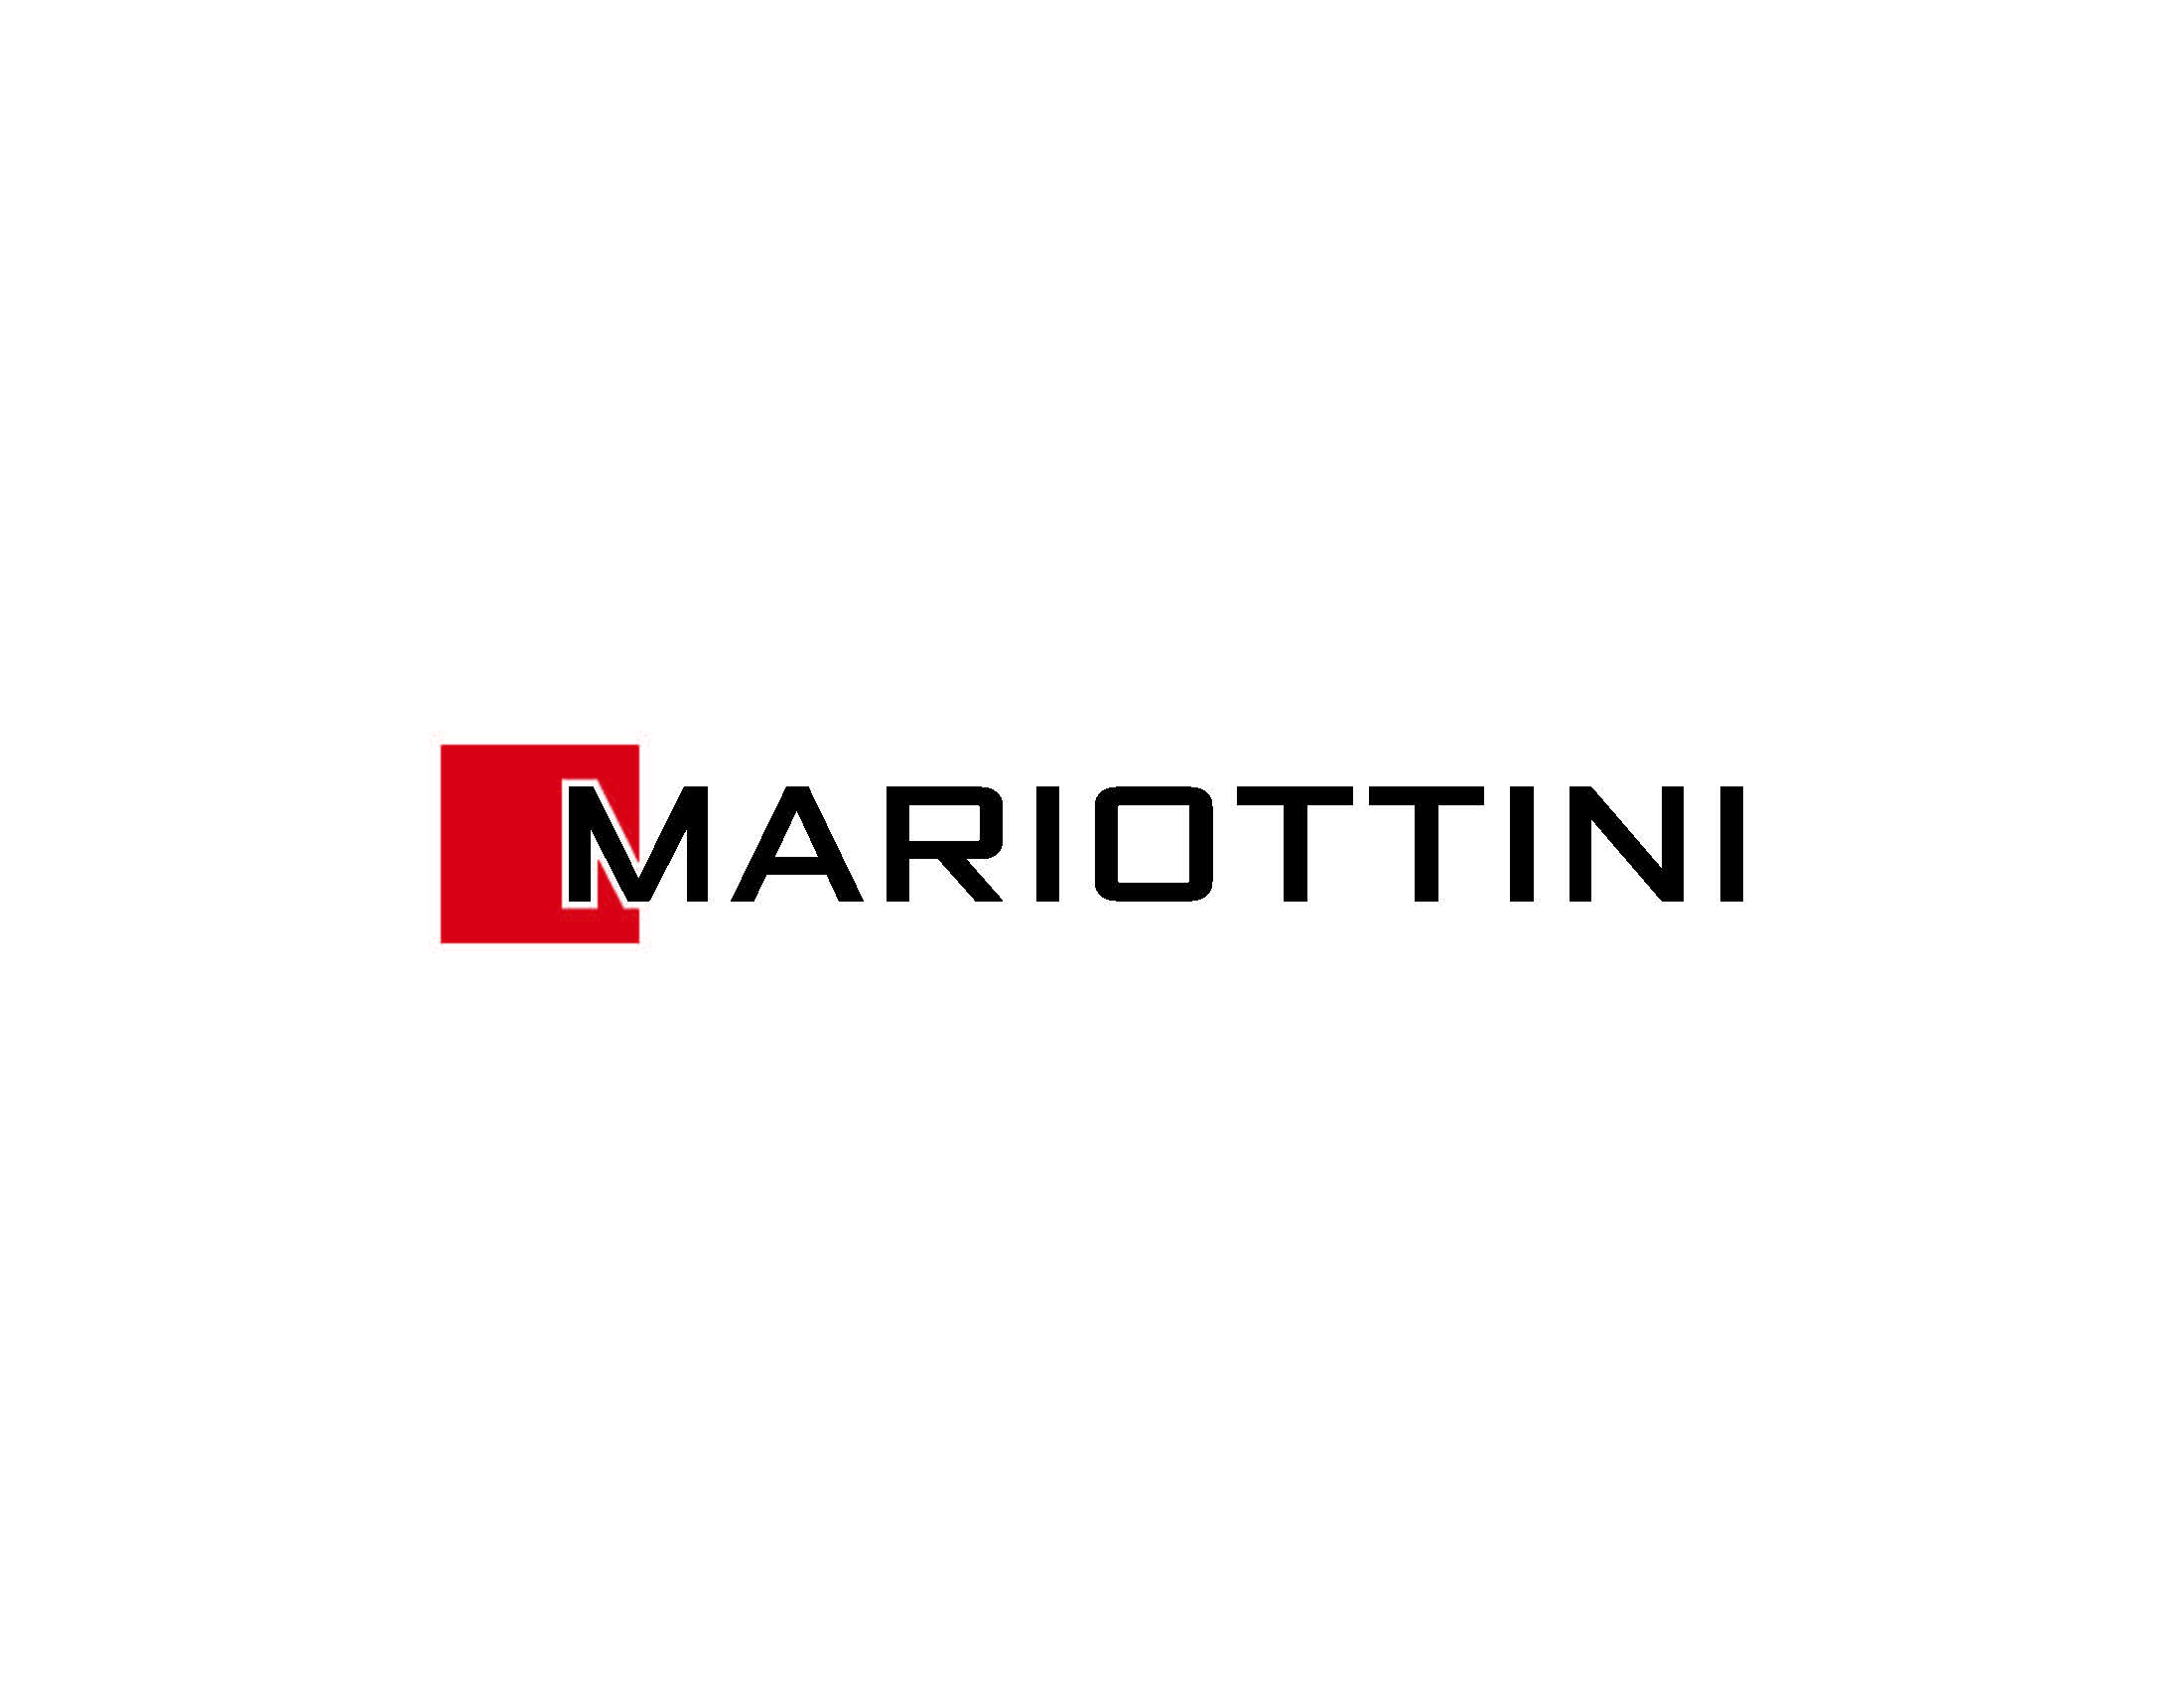 Mariottini-Logo-CMYK.jpg